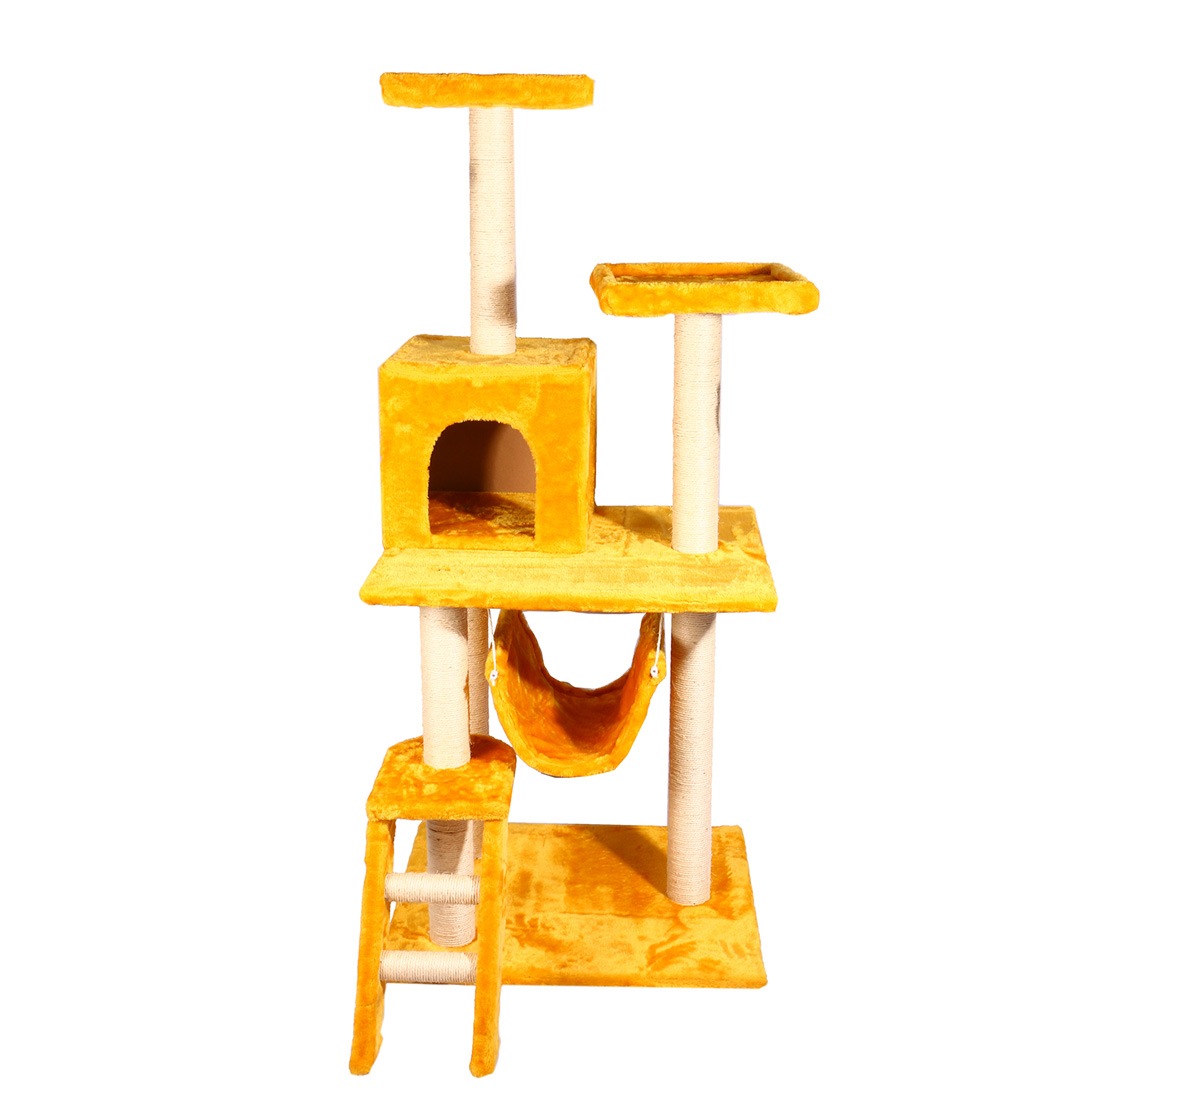 catspot premium dream world cat tree gym with cat condo  u0026 hammock  lxbxh  23 6     catspot premium dream world cat tree gym with cat condo  u0026 hammock      rh   dogspot in